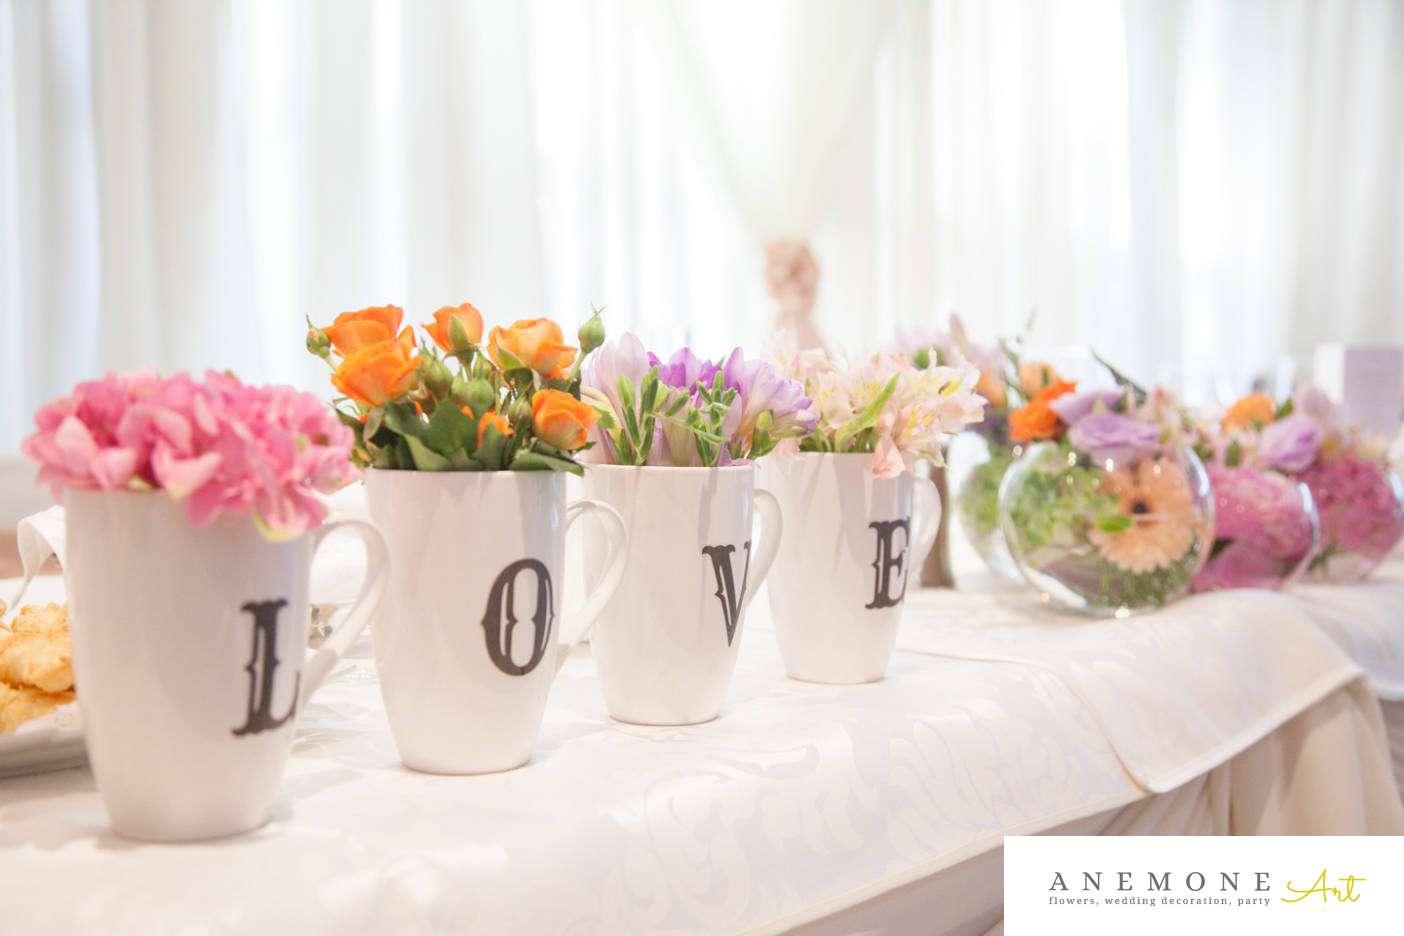 Poza, foto cu Flori de nunta hotel continental, prezidiu in Arad, Timisoara, Oradea (wedding flowers, bouquets) nunta Arad